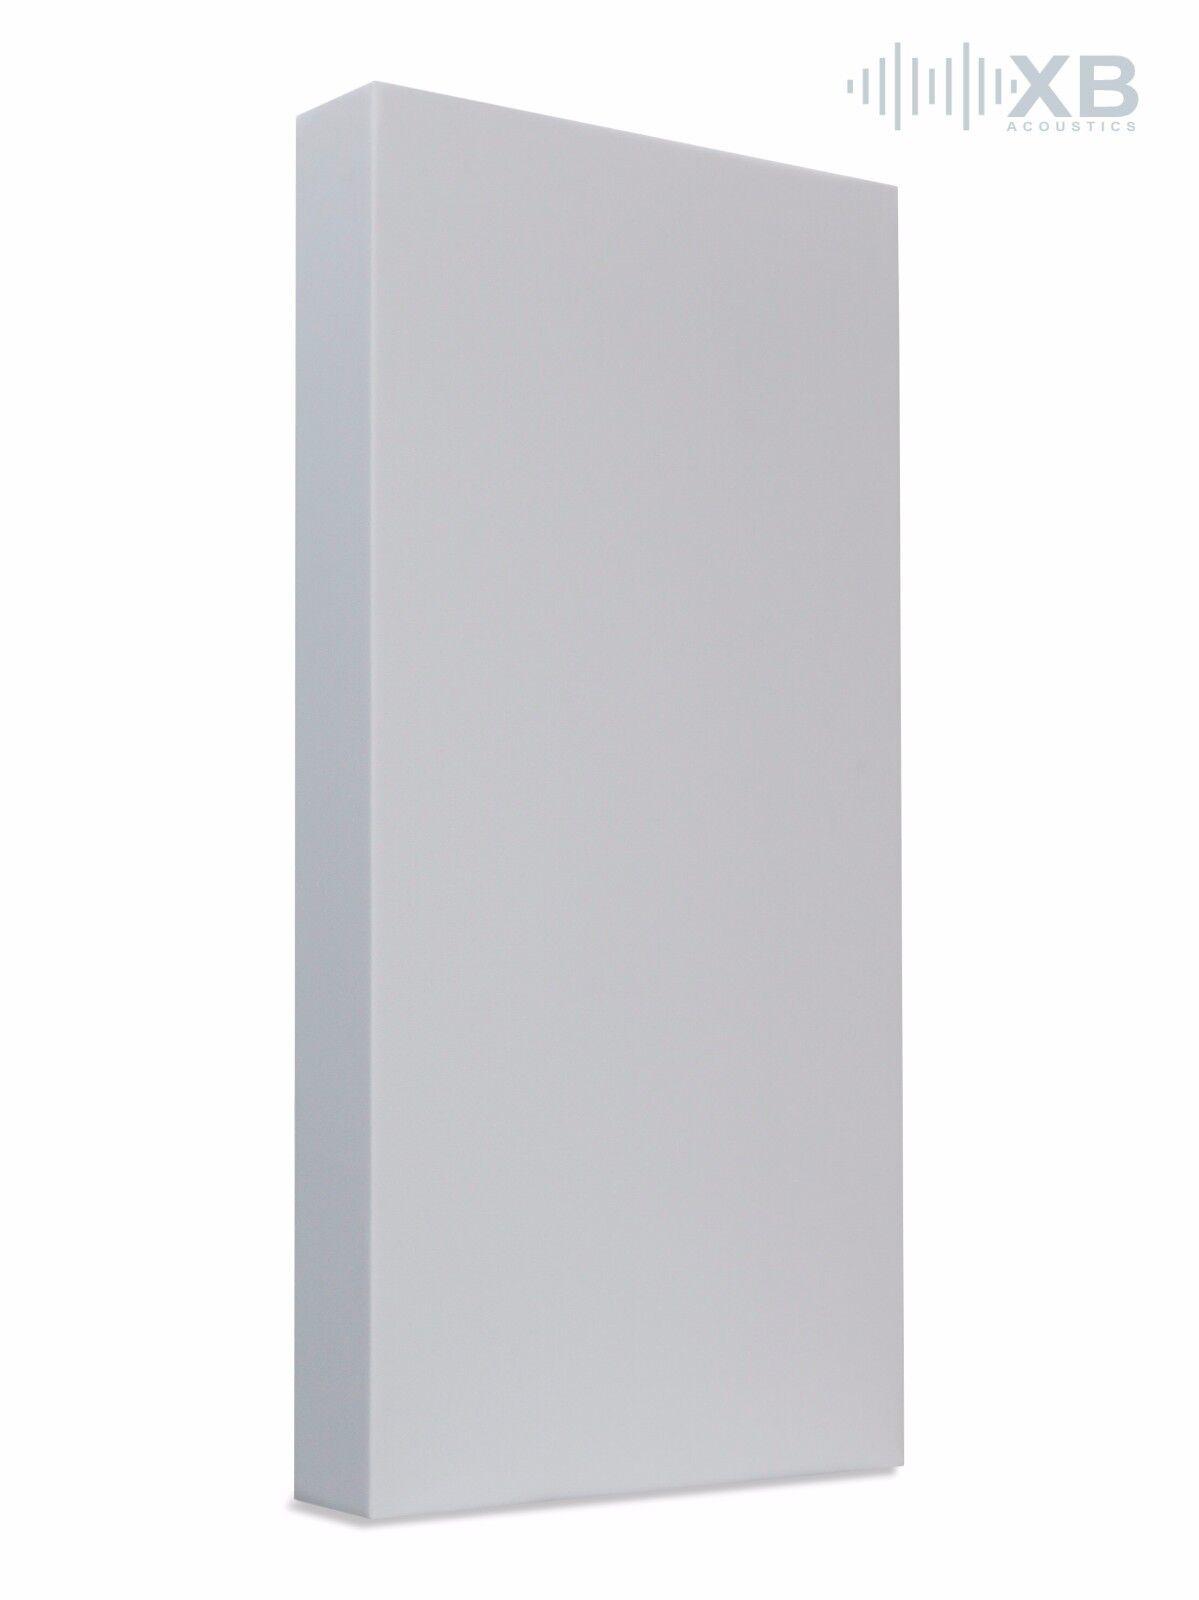 Akustikabsorber Tonstudio (Schallschutz) aus Basotect® 100x50x10cm weiß